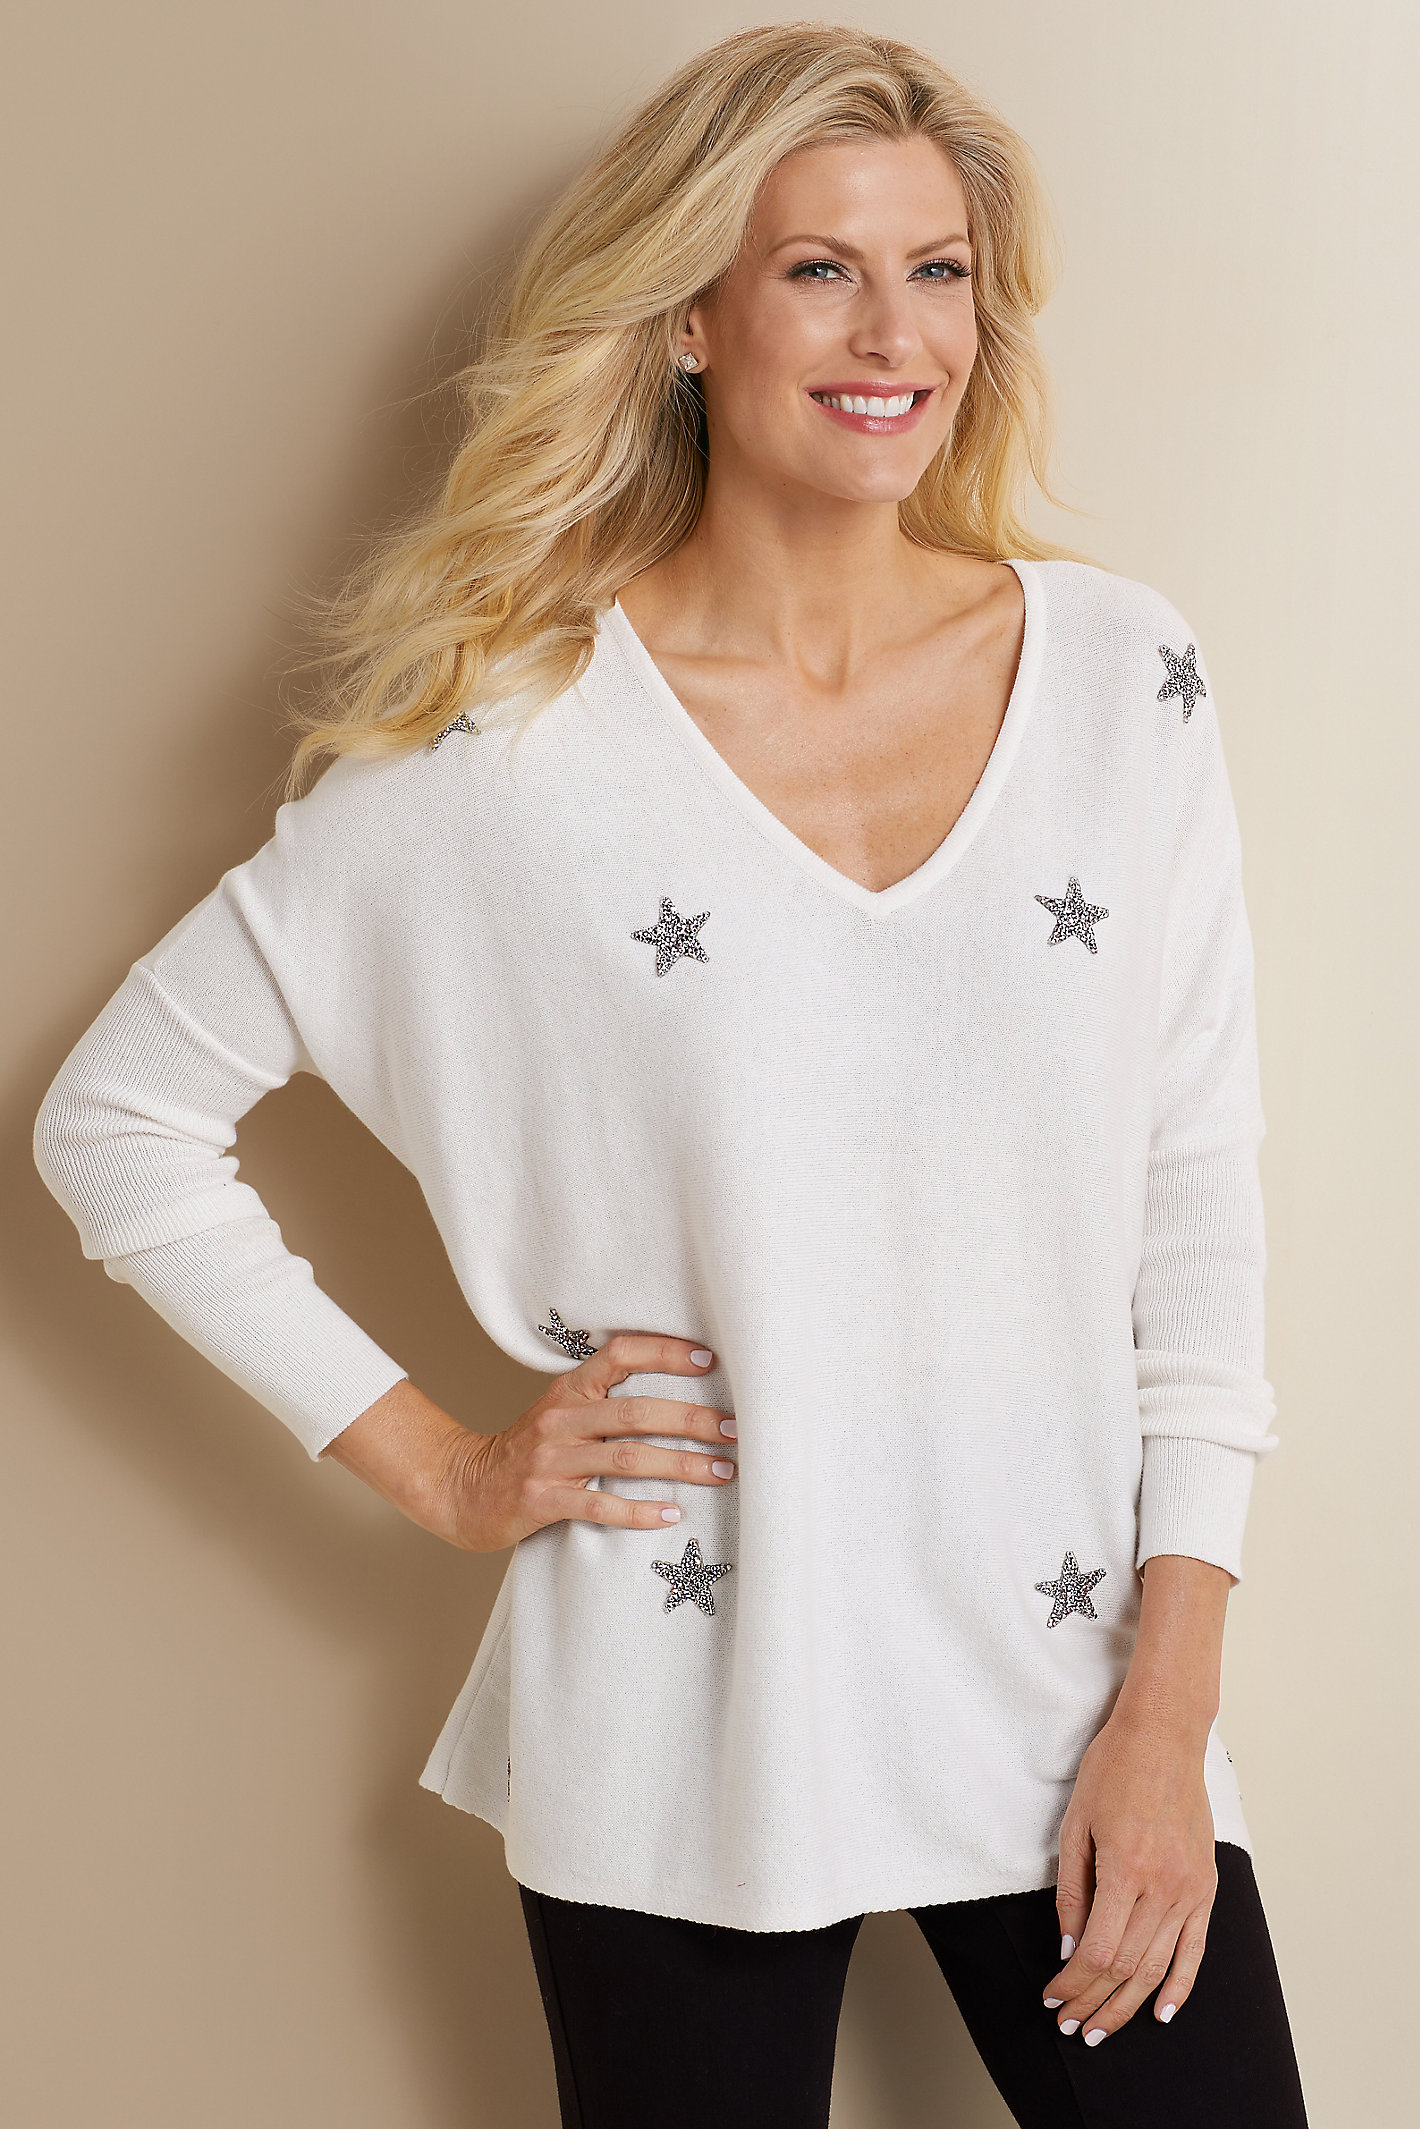 Starry Dreams Sweater